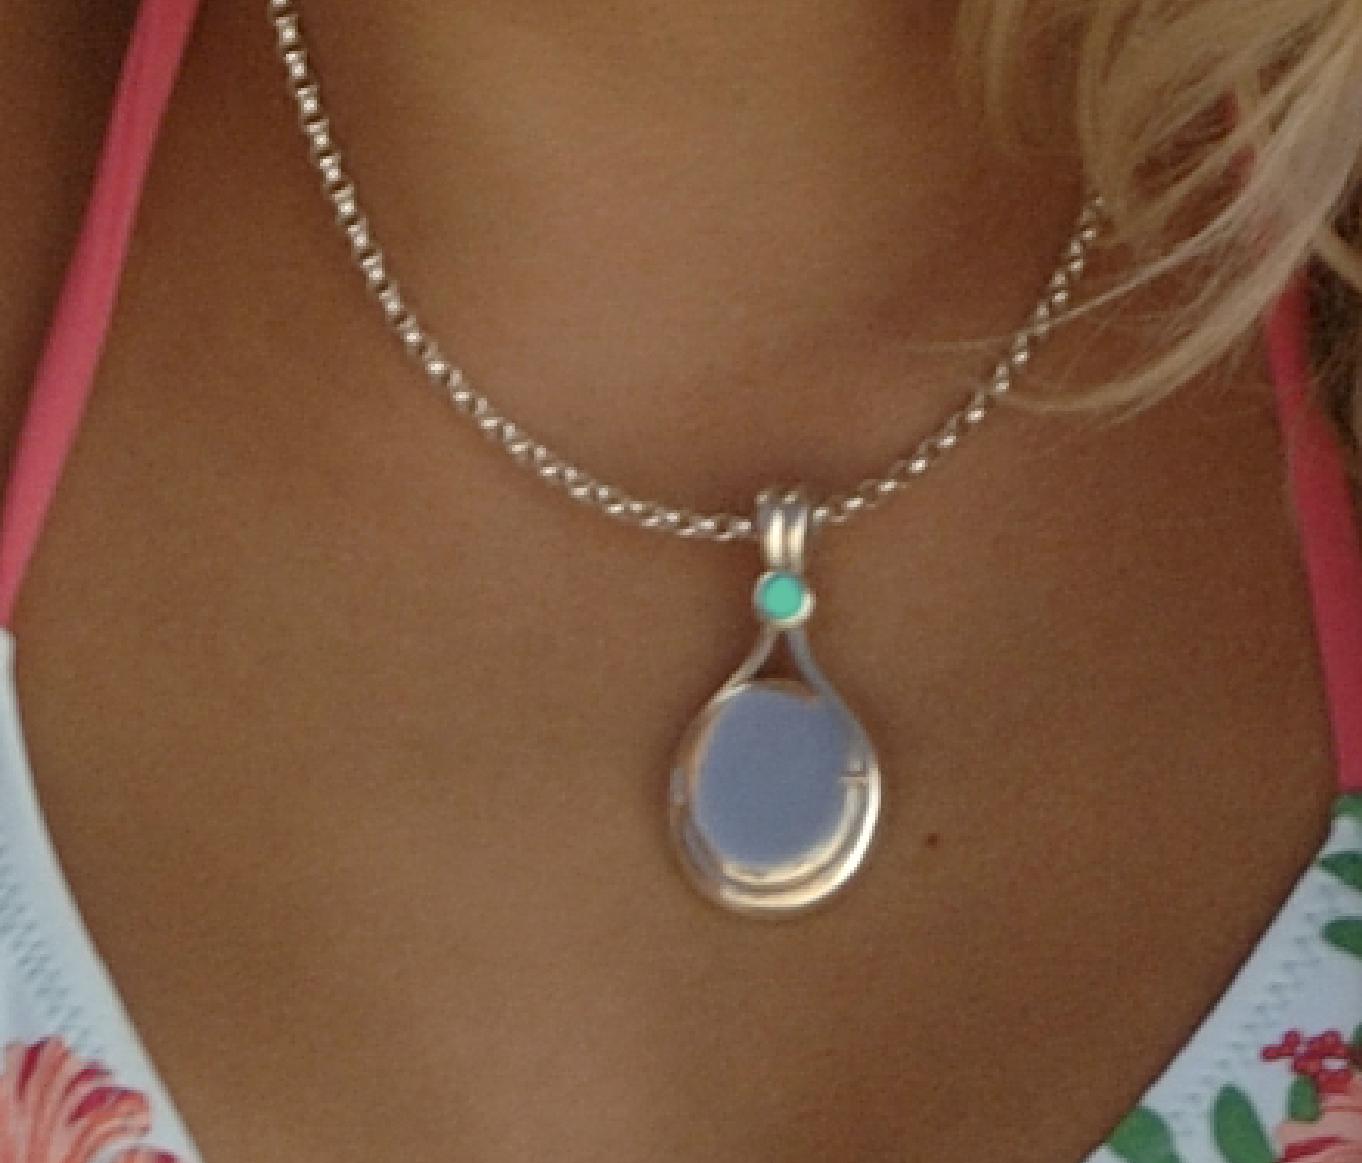 Bella ou Eva's locket